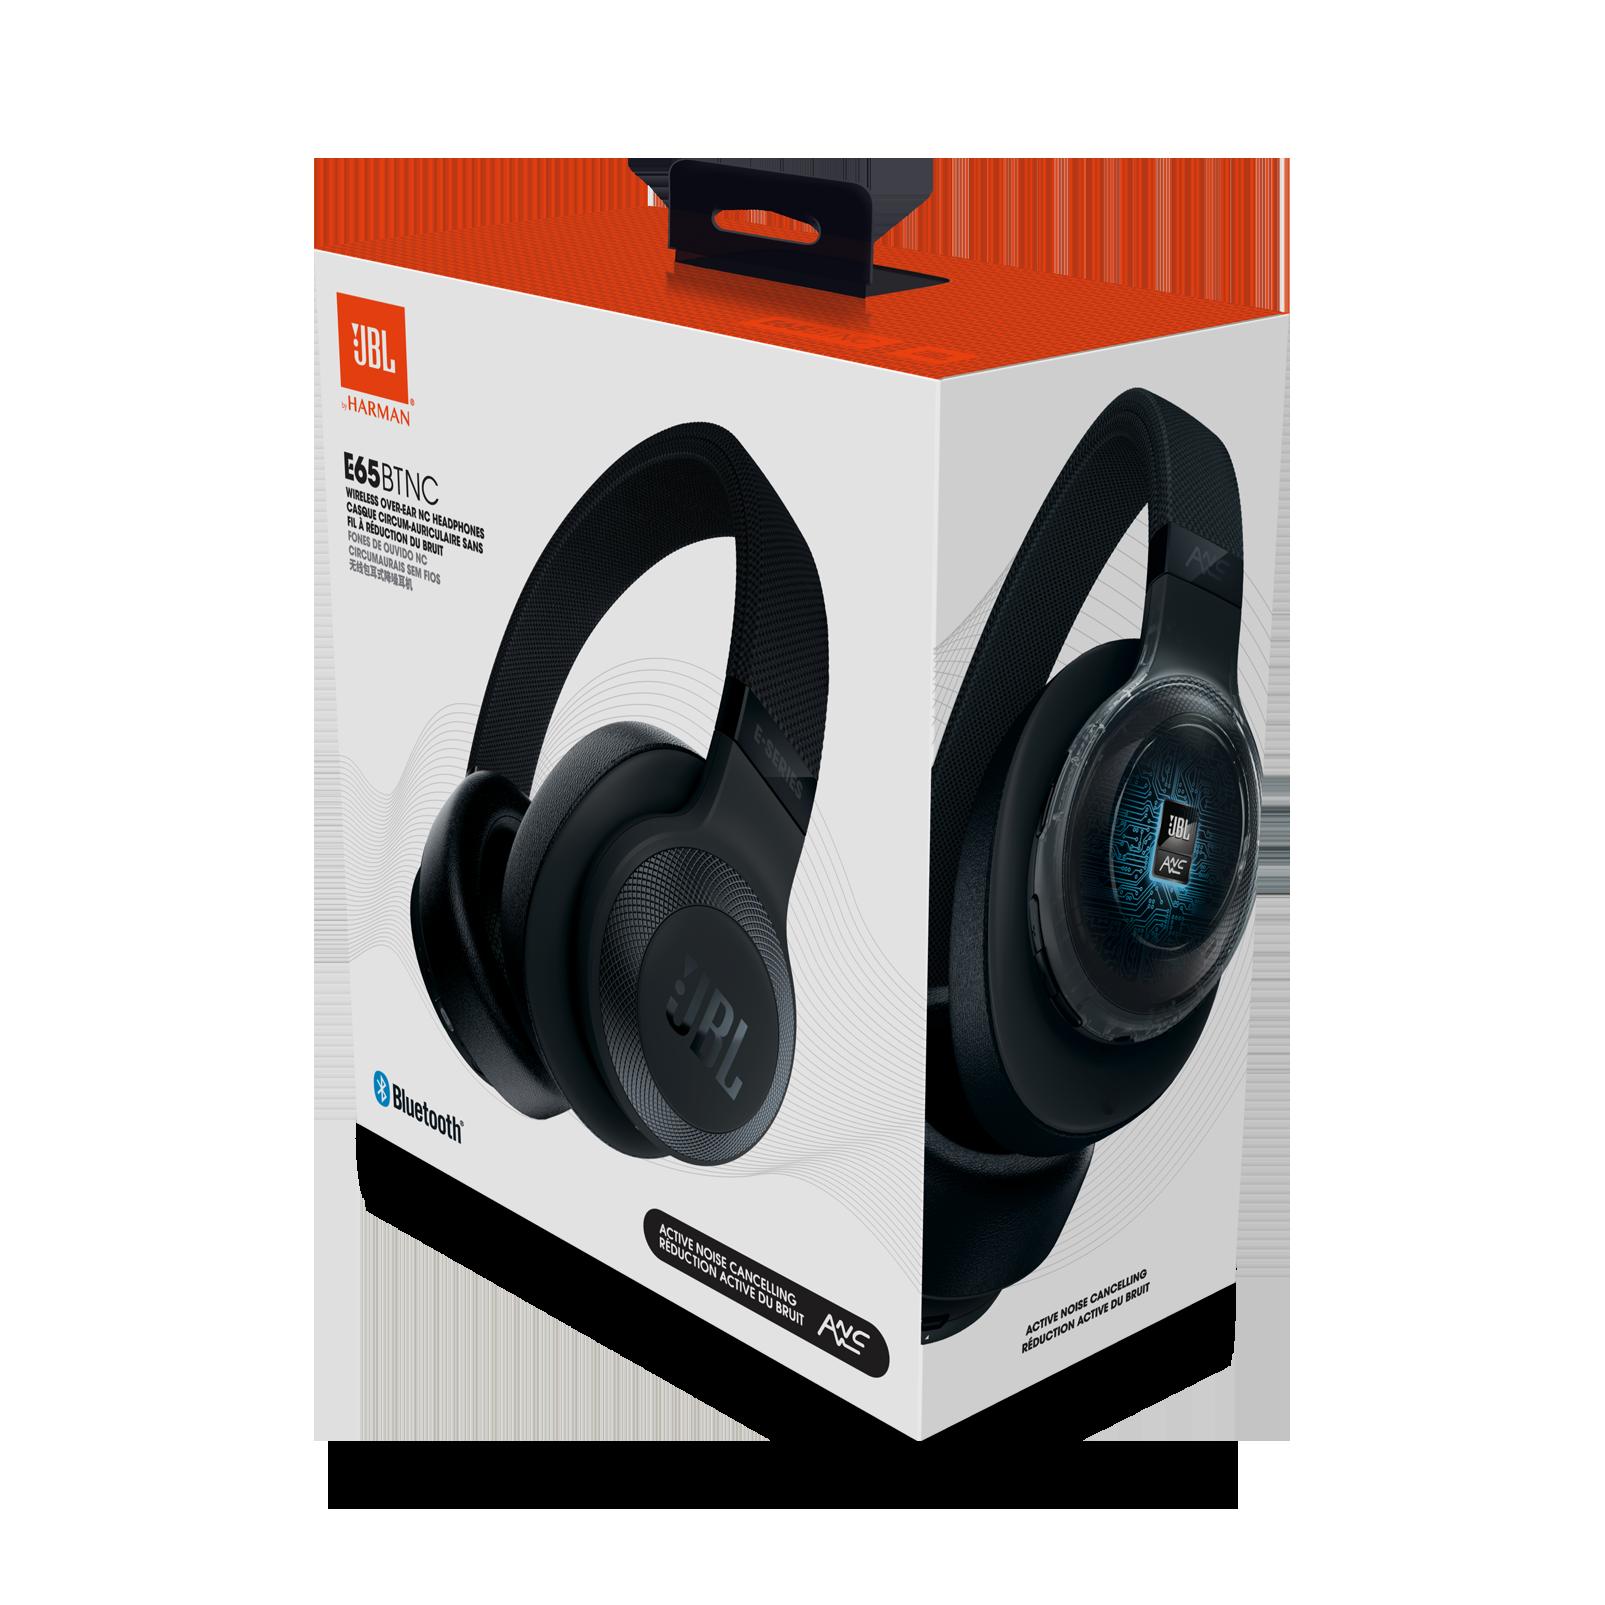 jbl e65btnc wireless over ear noise cancelling headphones